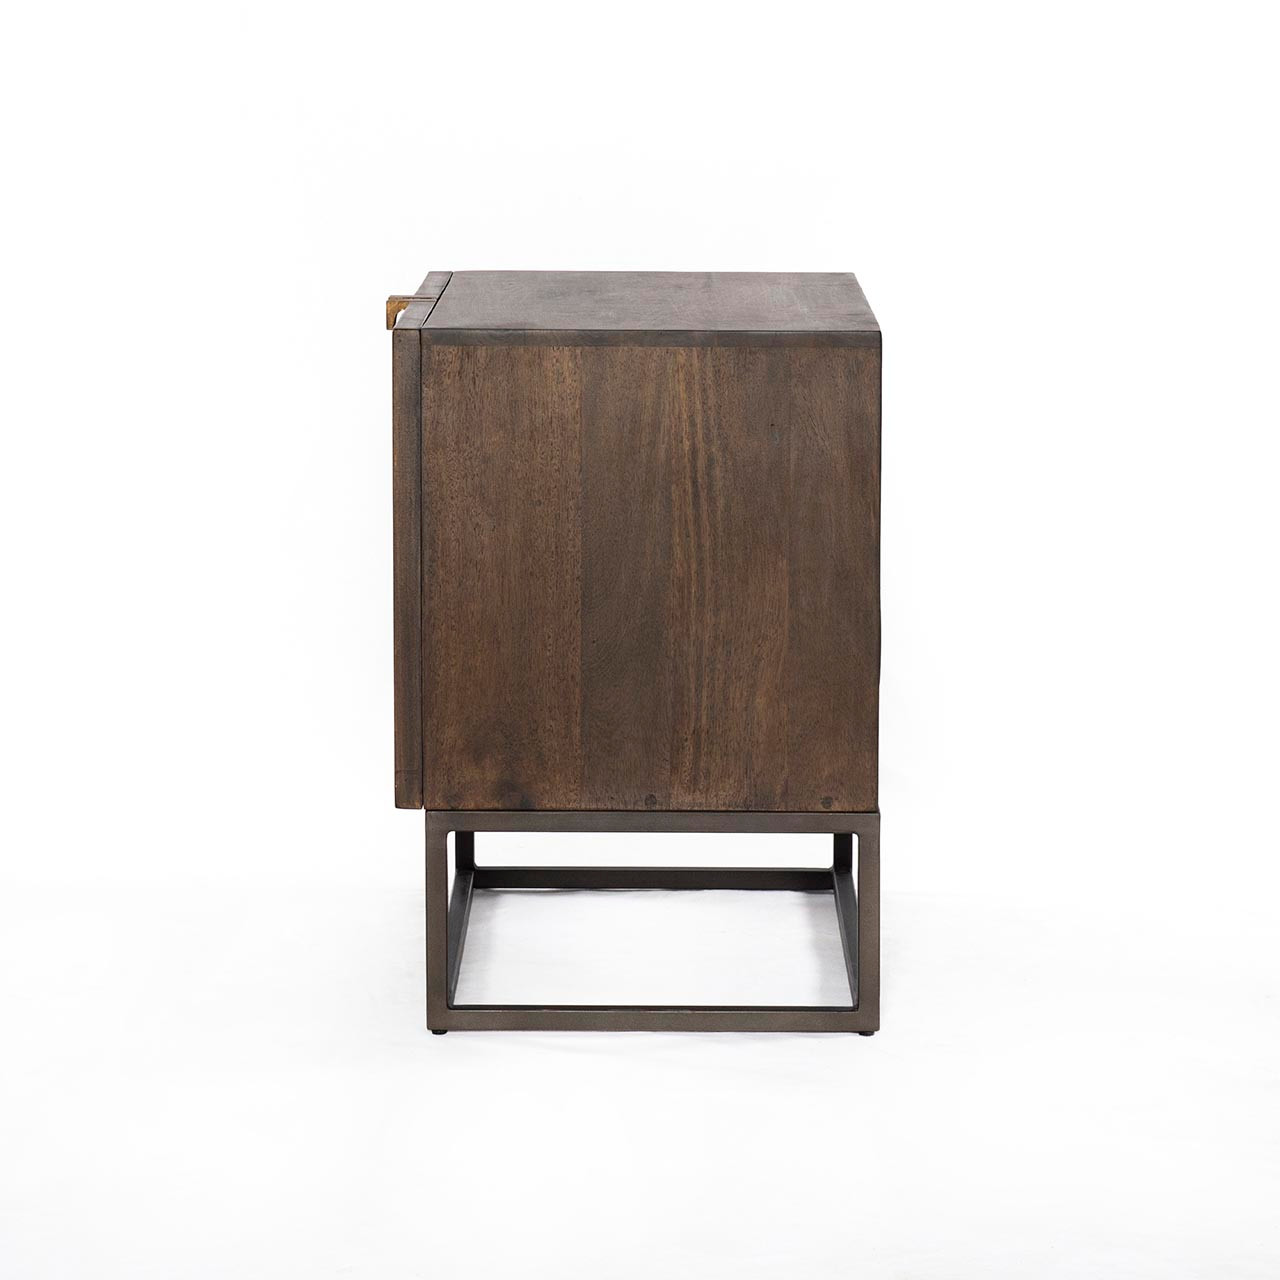 Bauer Cabinet Nightstand - Gunmetal